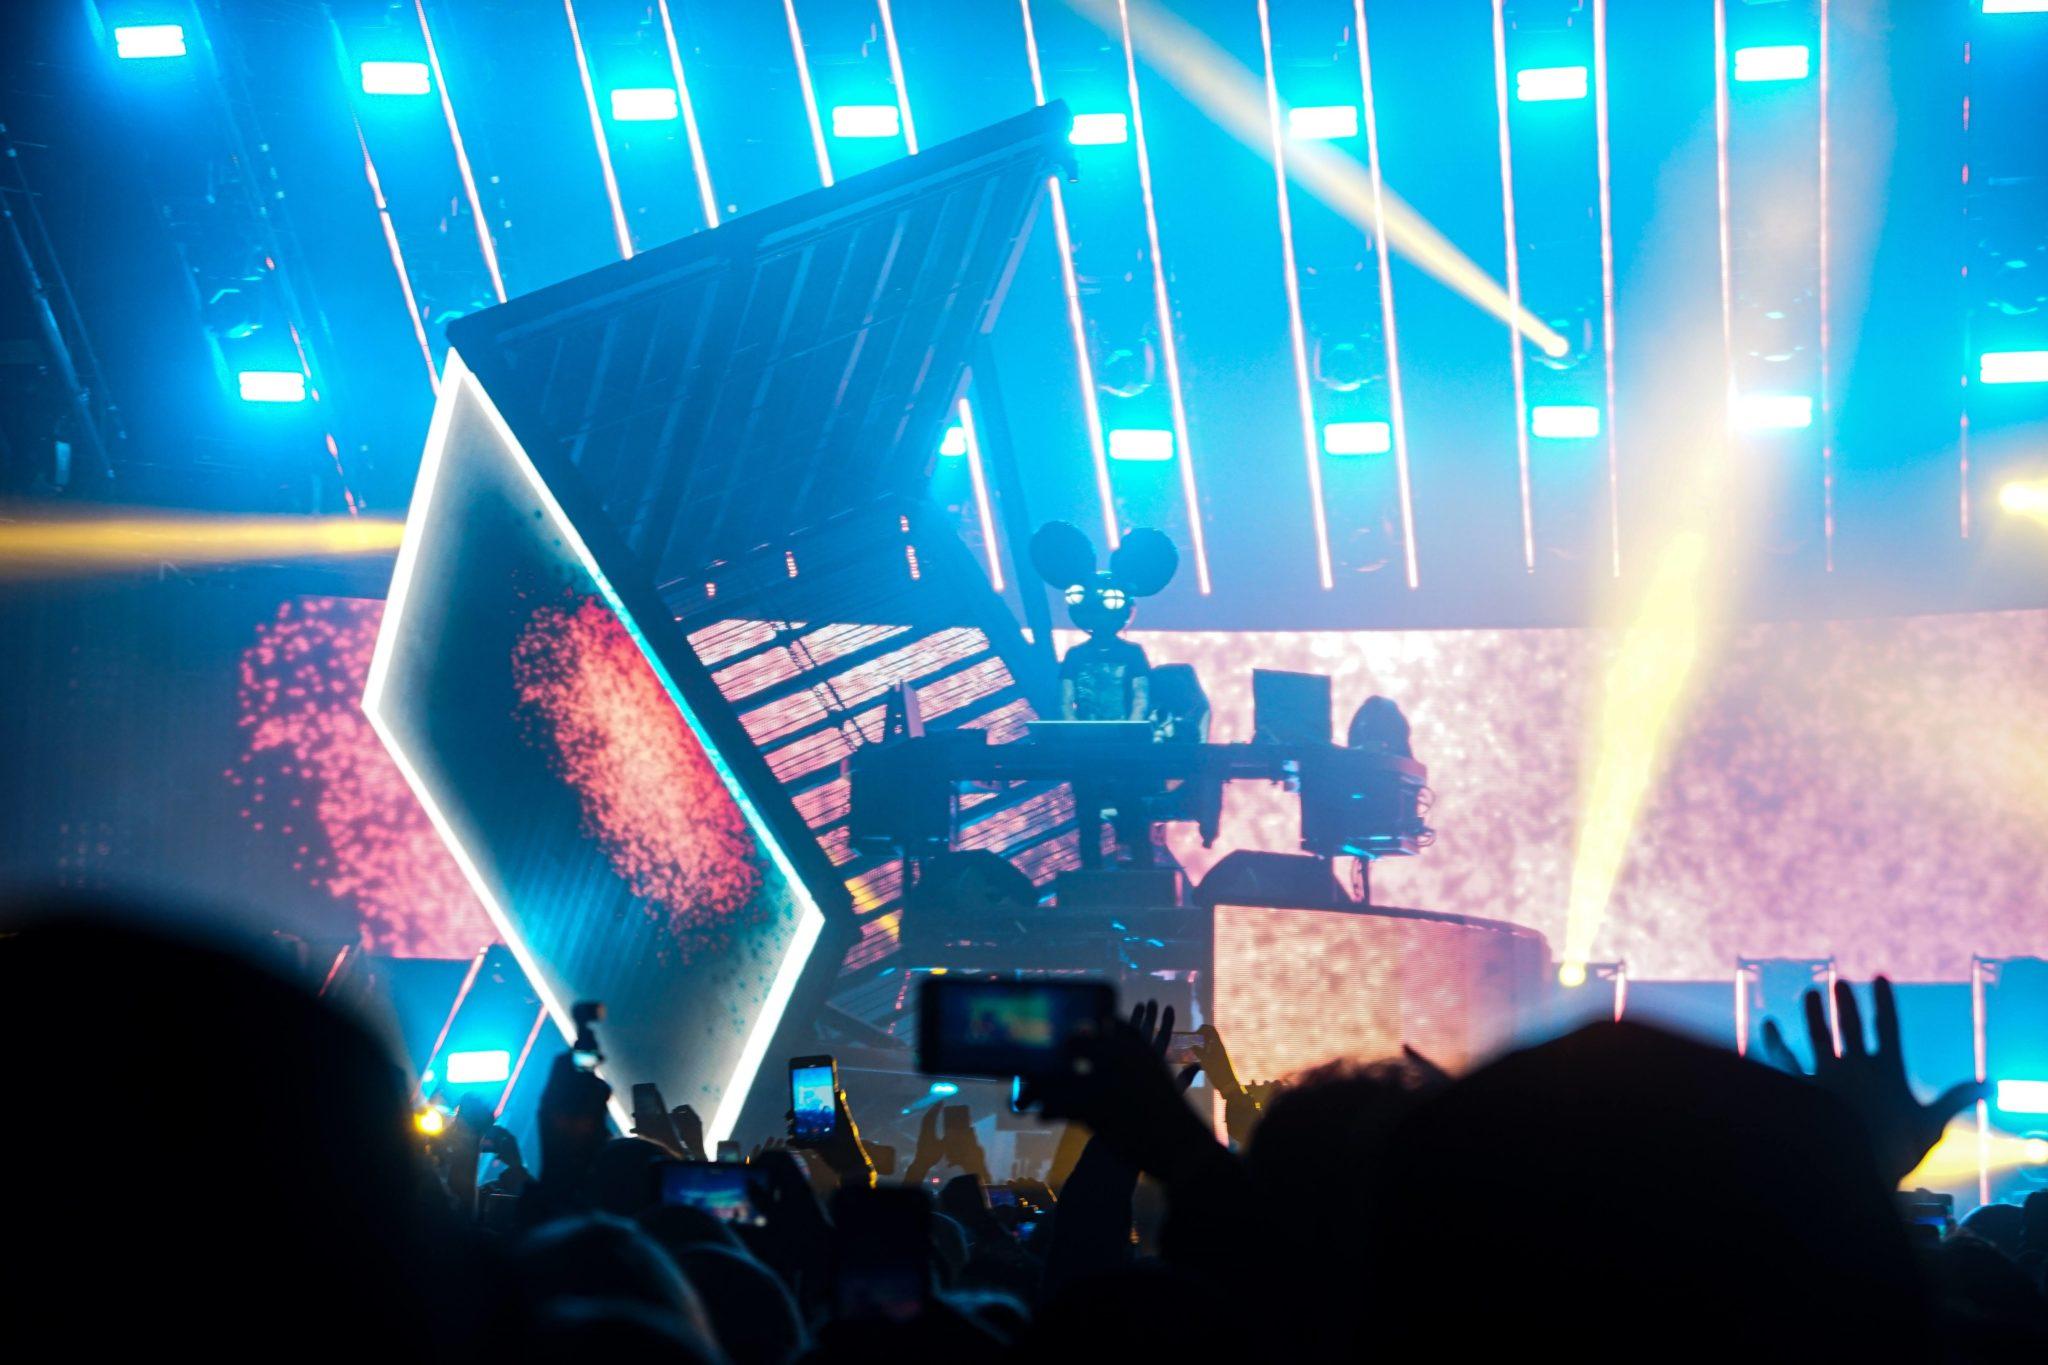 Deadmau5: Cube v3 Tour